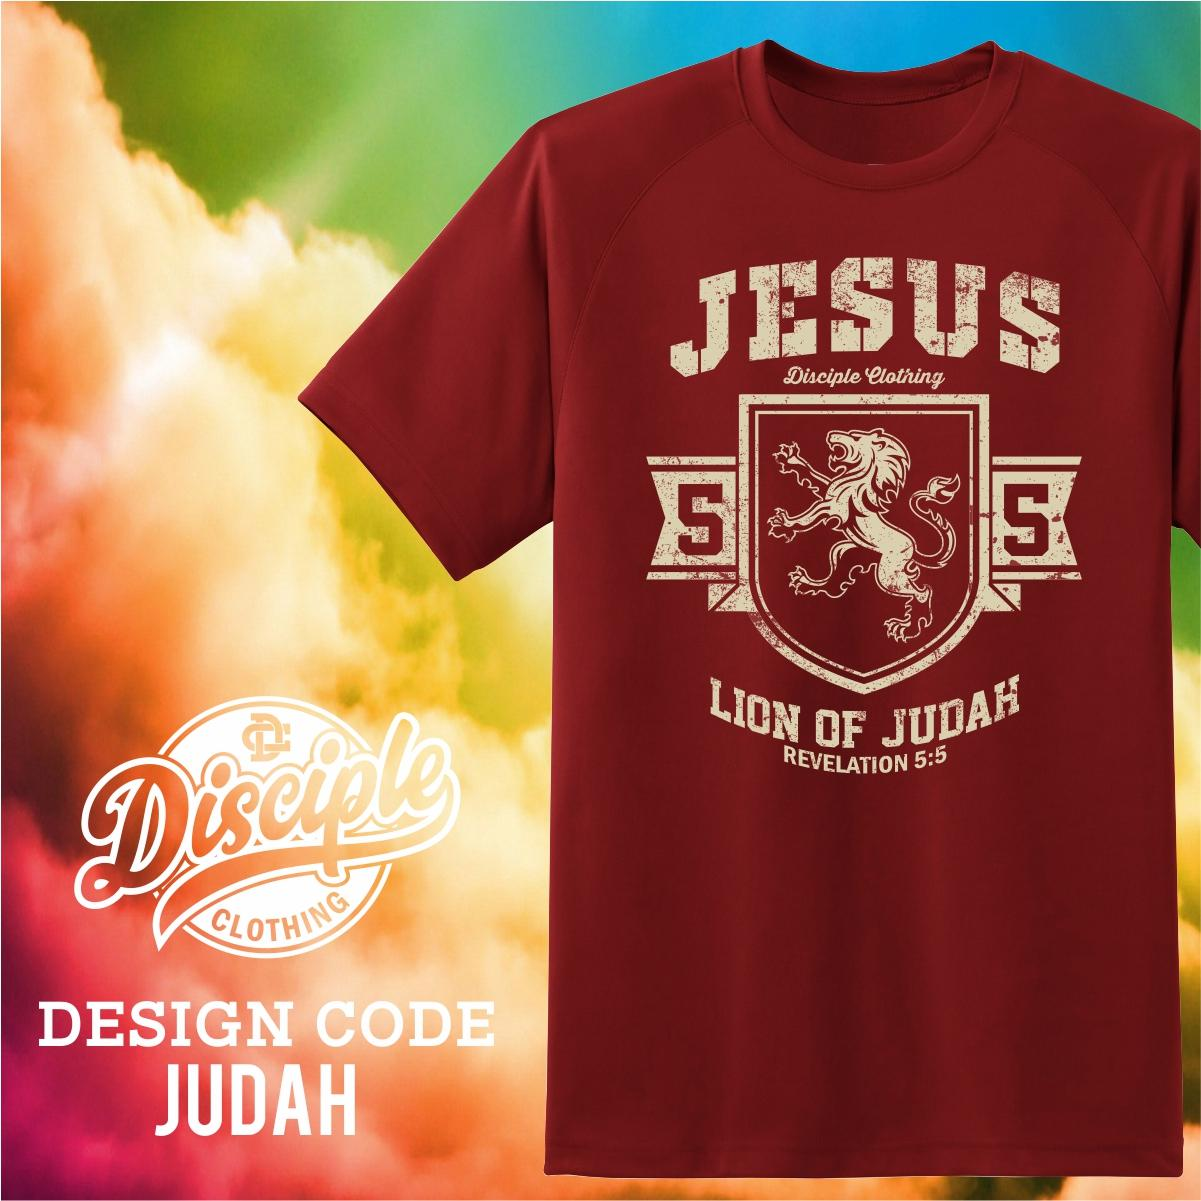 79b5a7c4a24 Disciple Clothing Christian Inspirational Jesus Lion of Judah Shirt